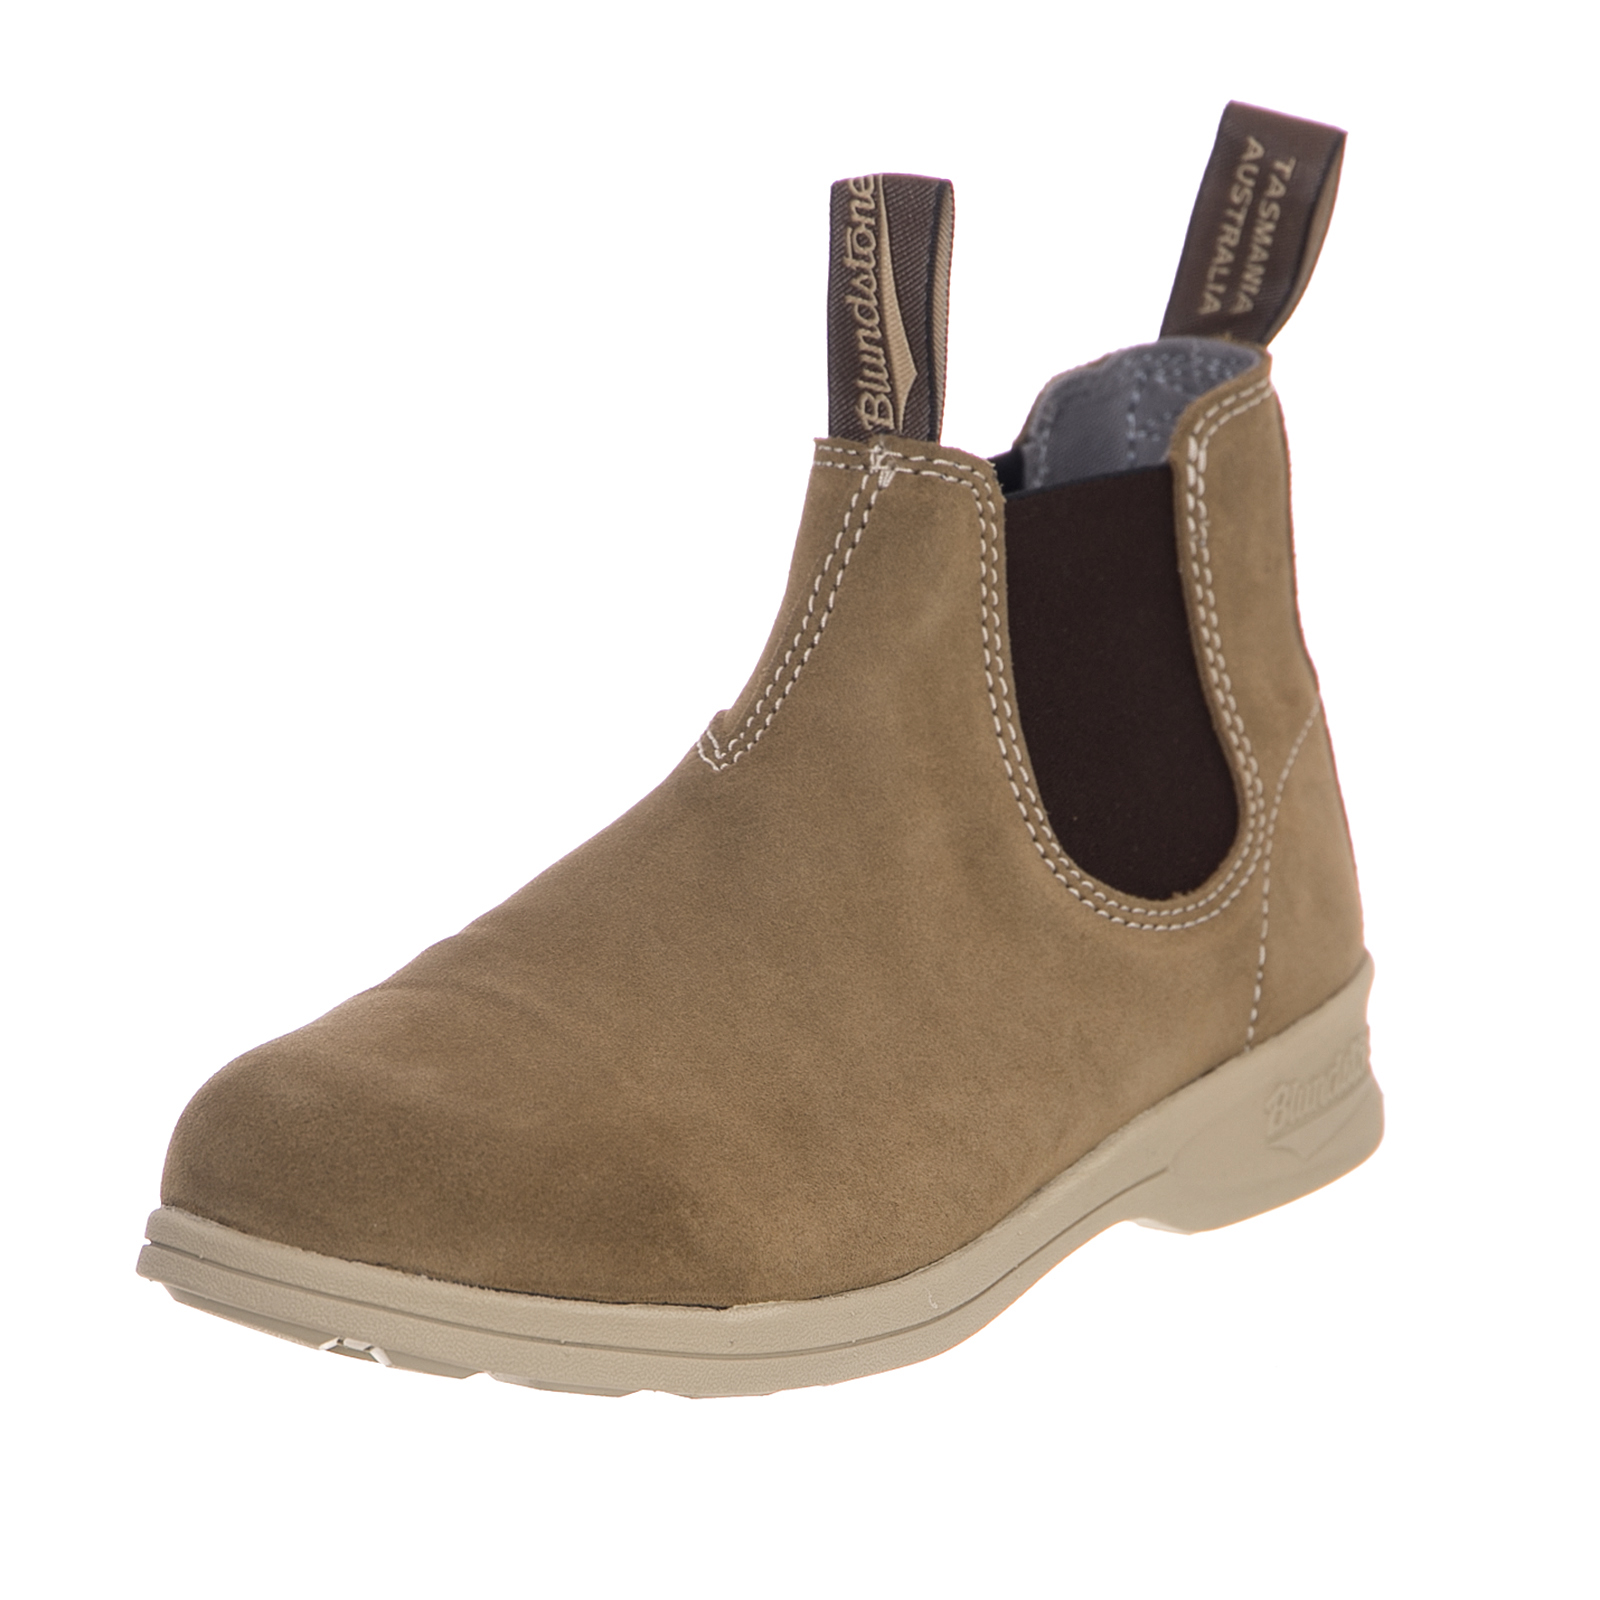 azulndstone botas 1396 El bota Sand  Beige